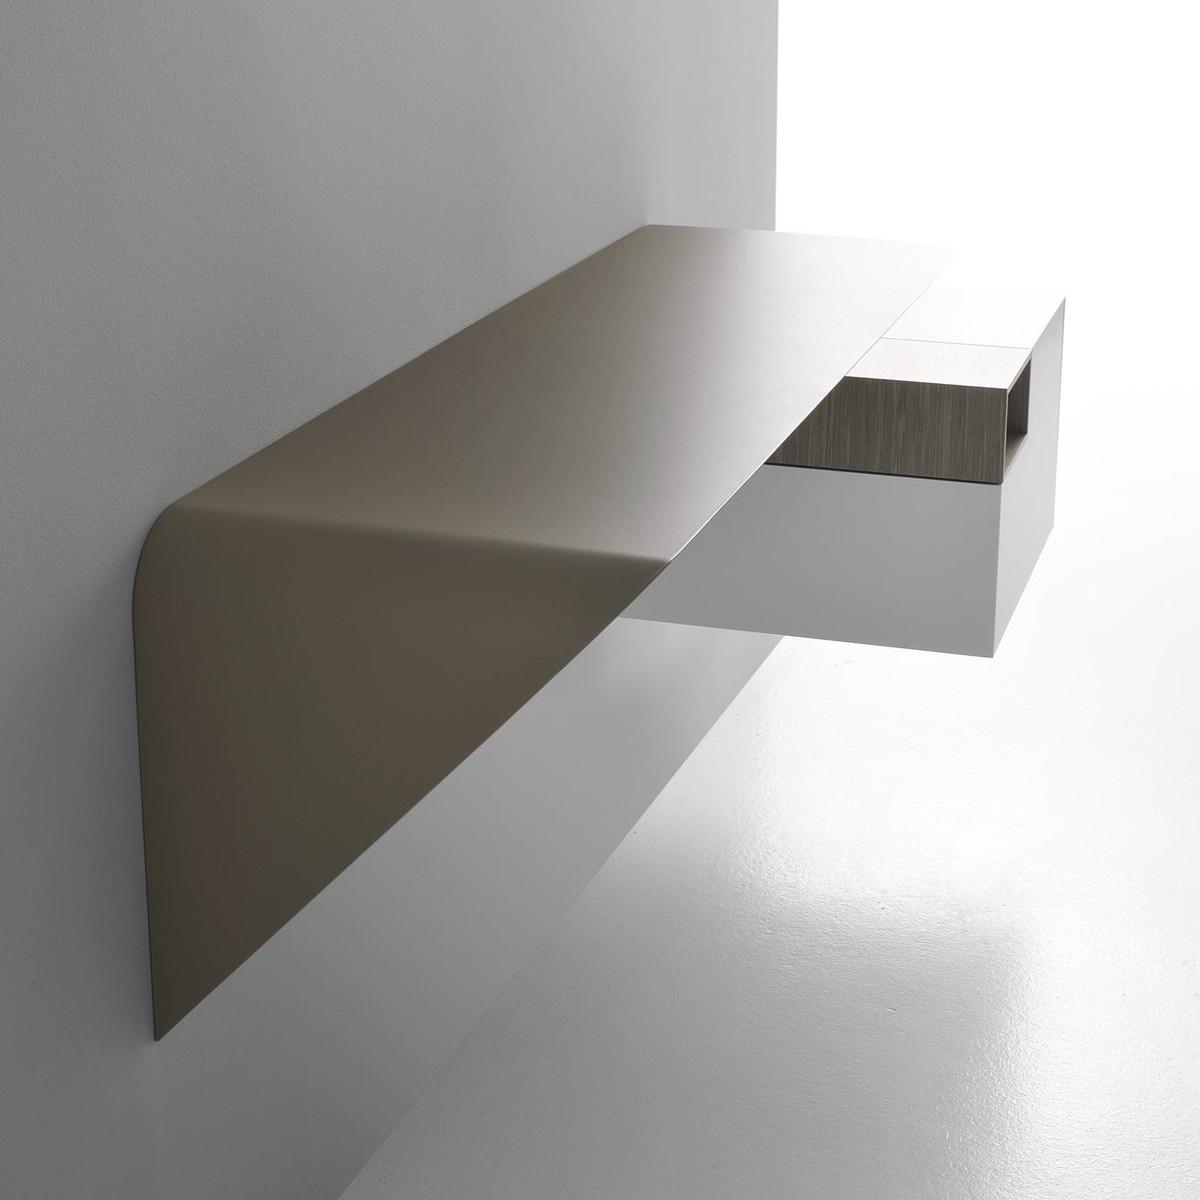 types of sofas brown leather sofa blue carpet mamba light wall shelf   mdf italia ambientedirect.com